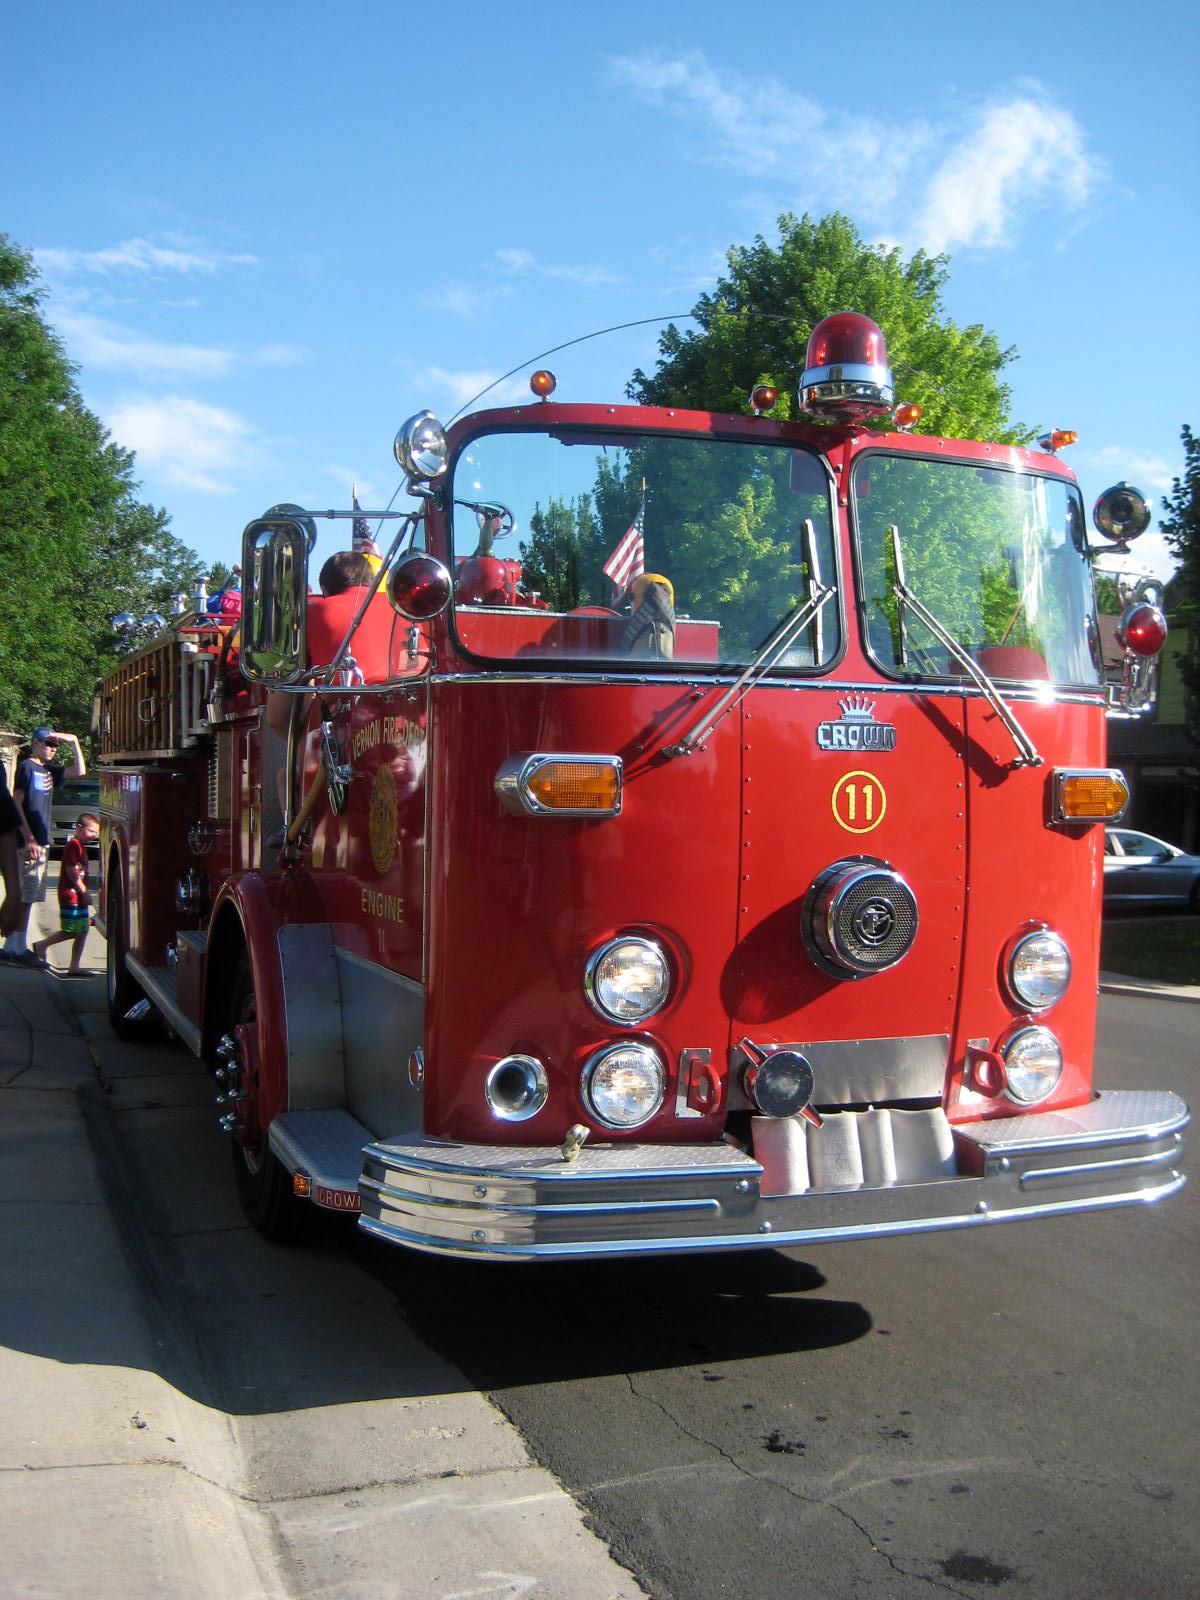 Antique fire truck rides